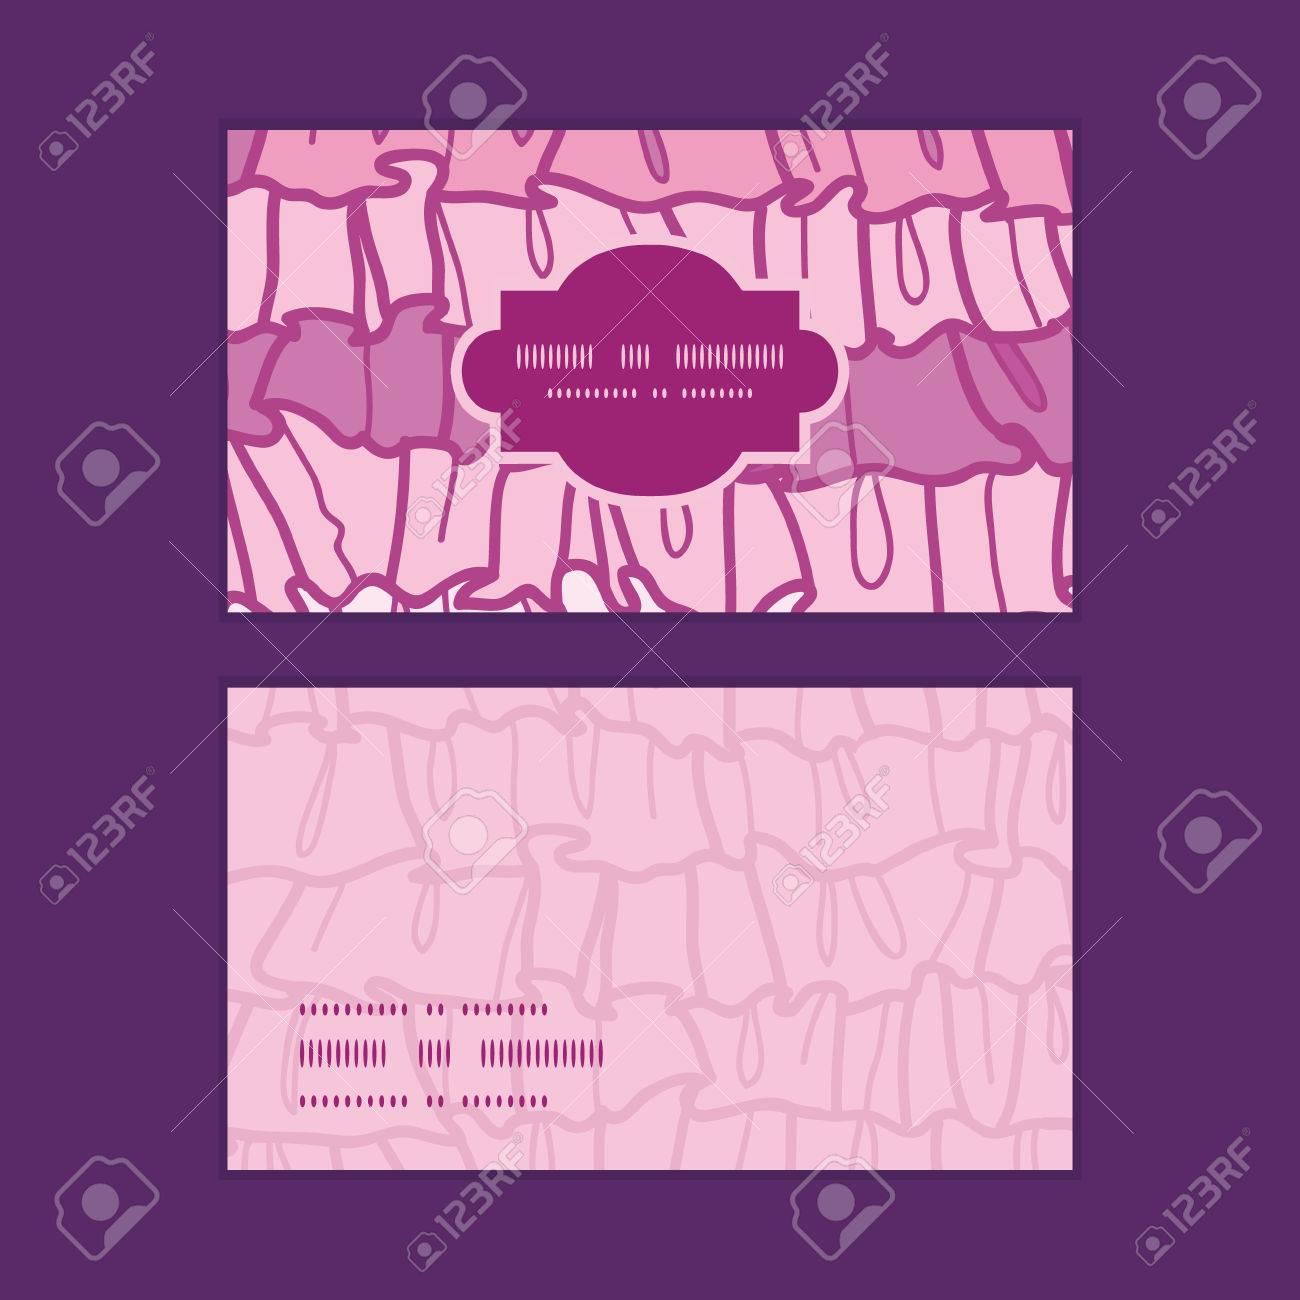 Vecteur Rose Volants Rayures Du Tissu Bti Horizontal Motif Cartes